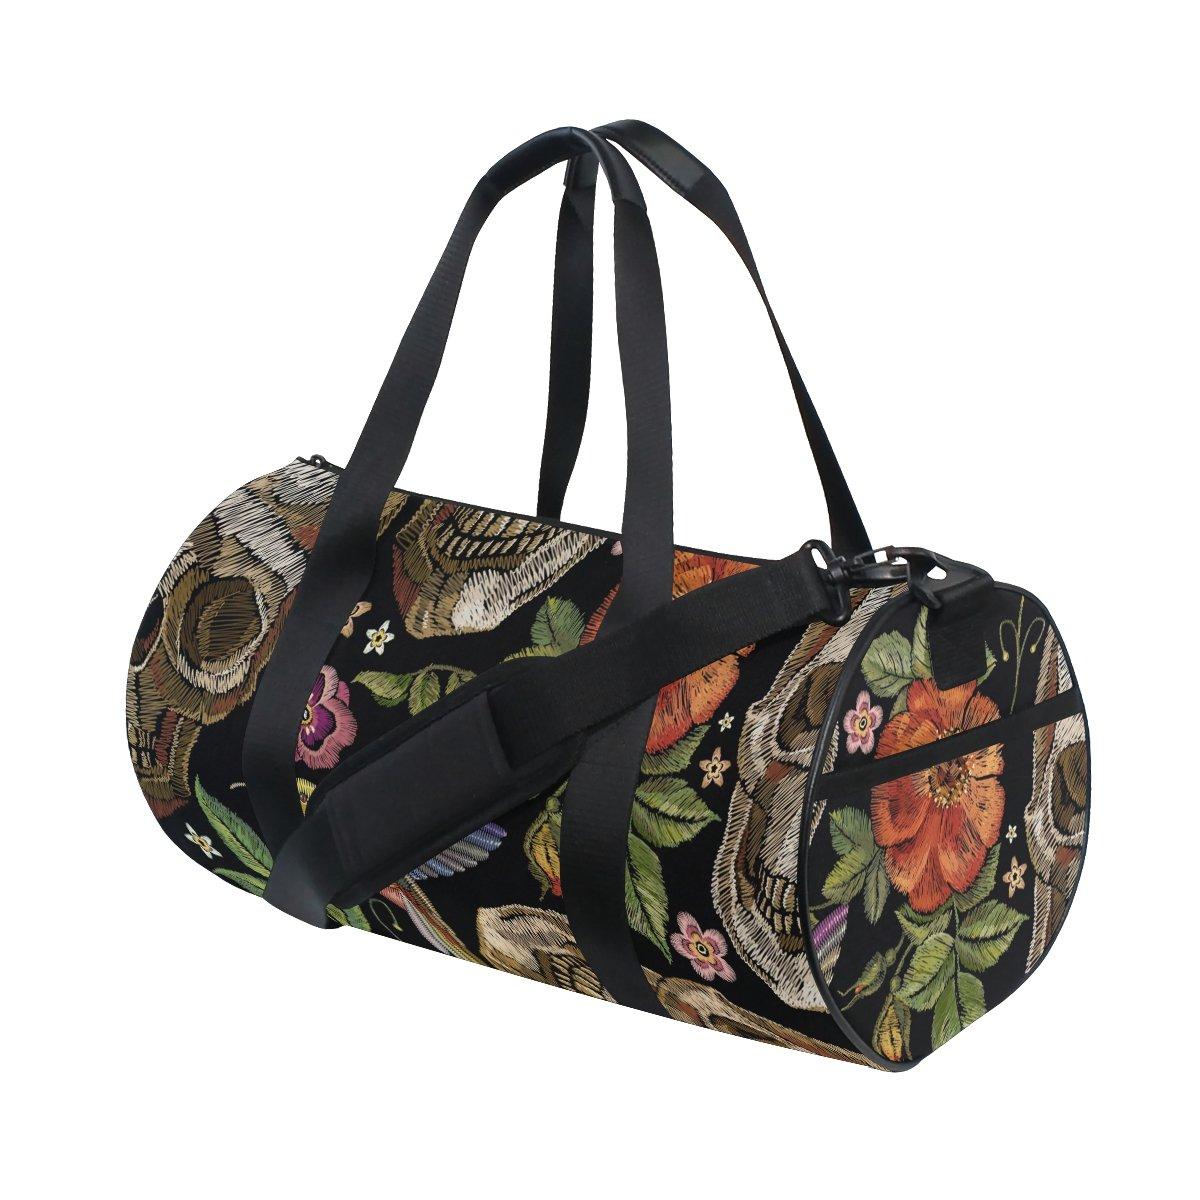 Naanle Gothic Embroidered Skull Rose Hummingbird Gym bag Sports Travel Duffle Bags for Men Women Boys Girls Kids